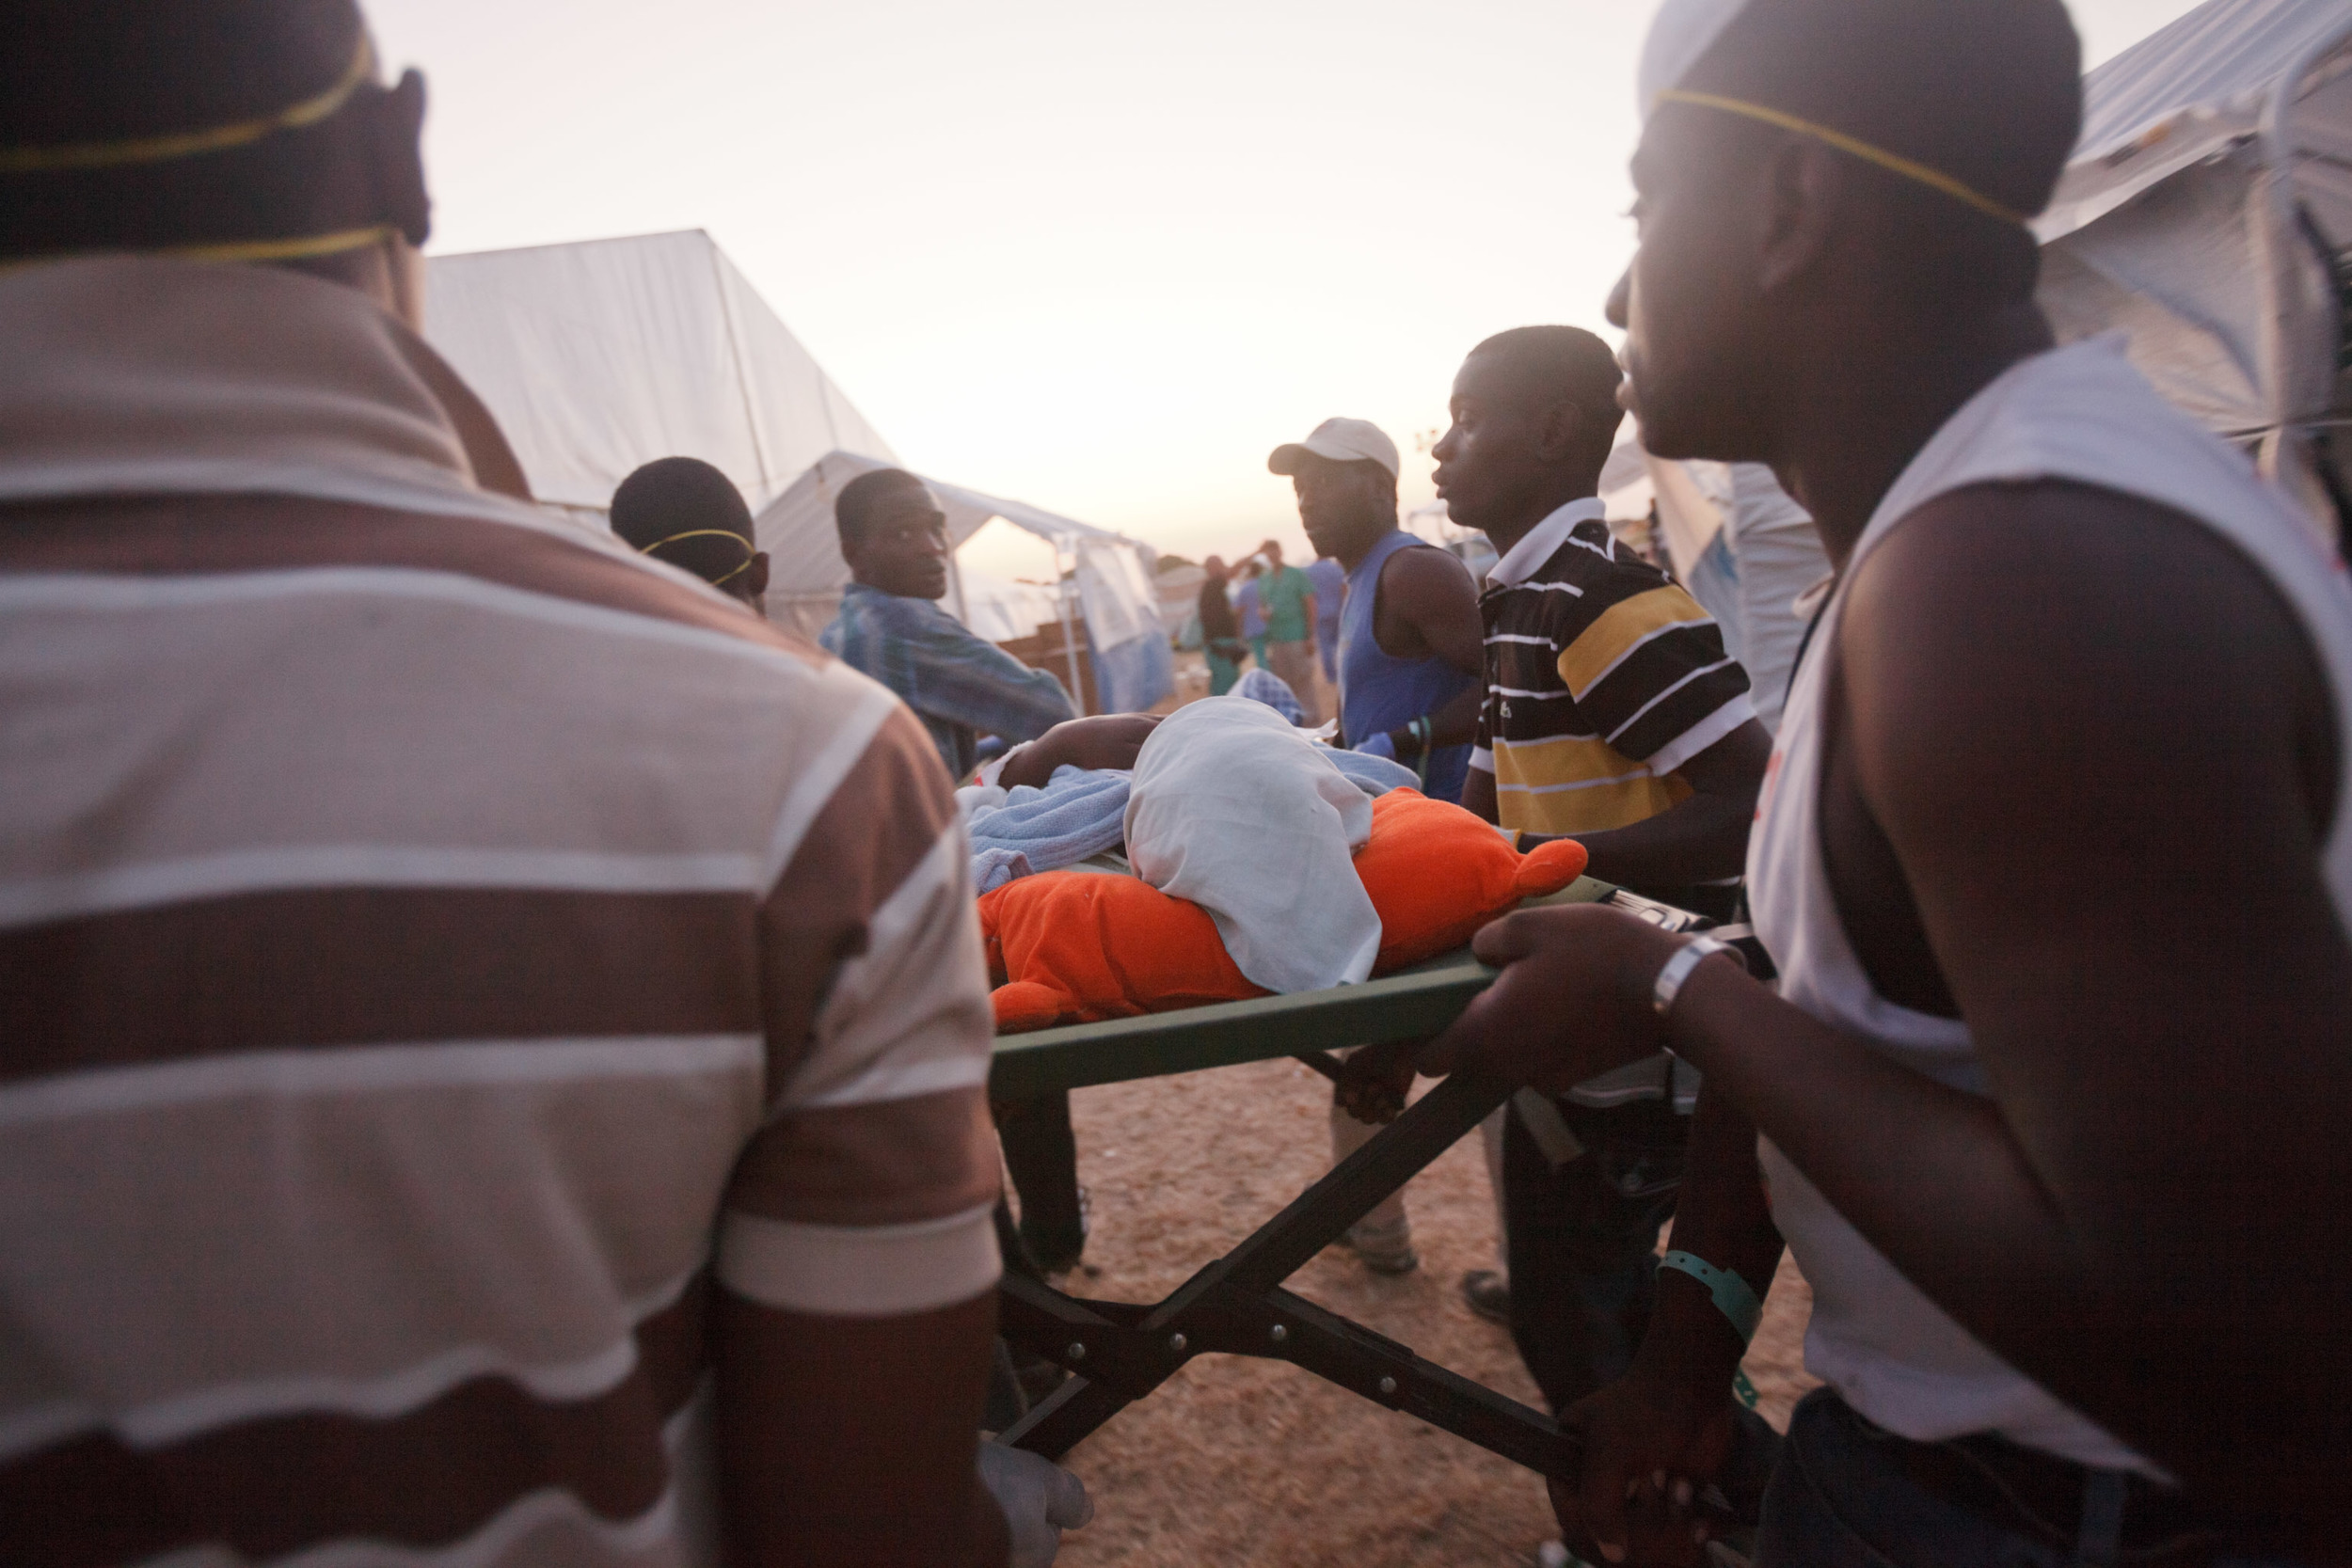 haiti-field-hospital_03.jpg